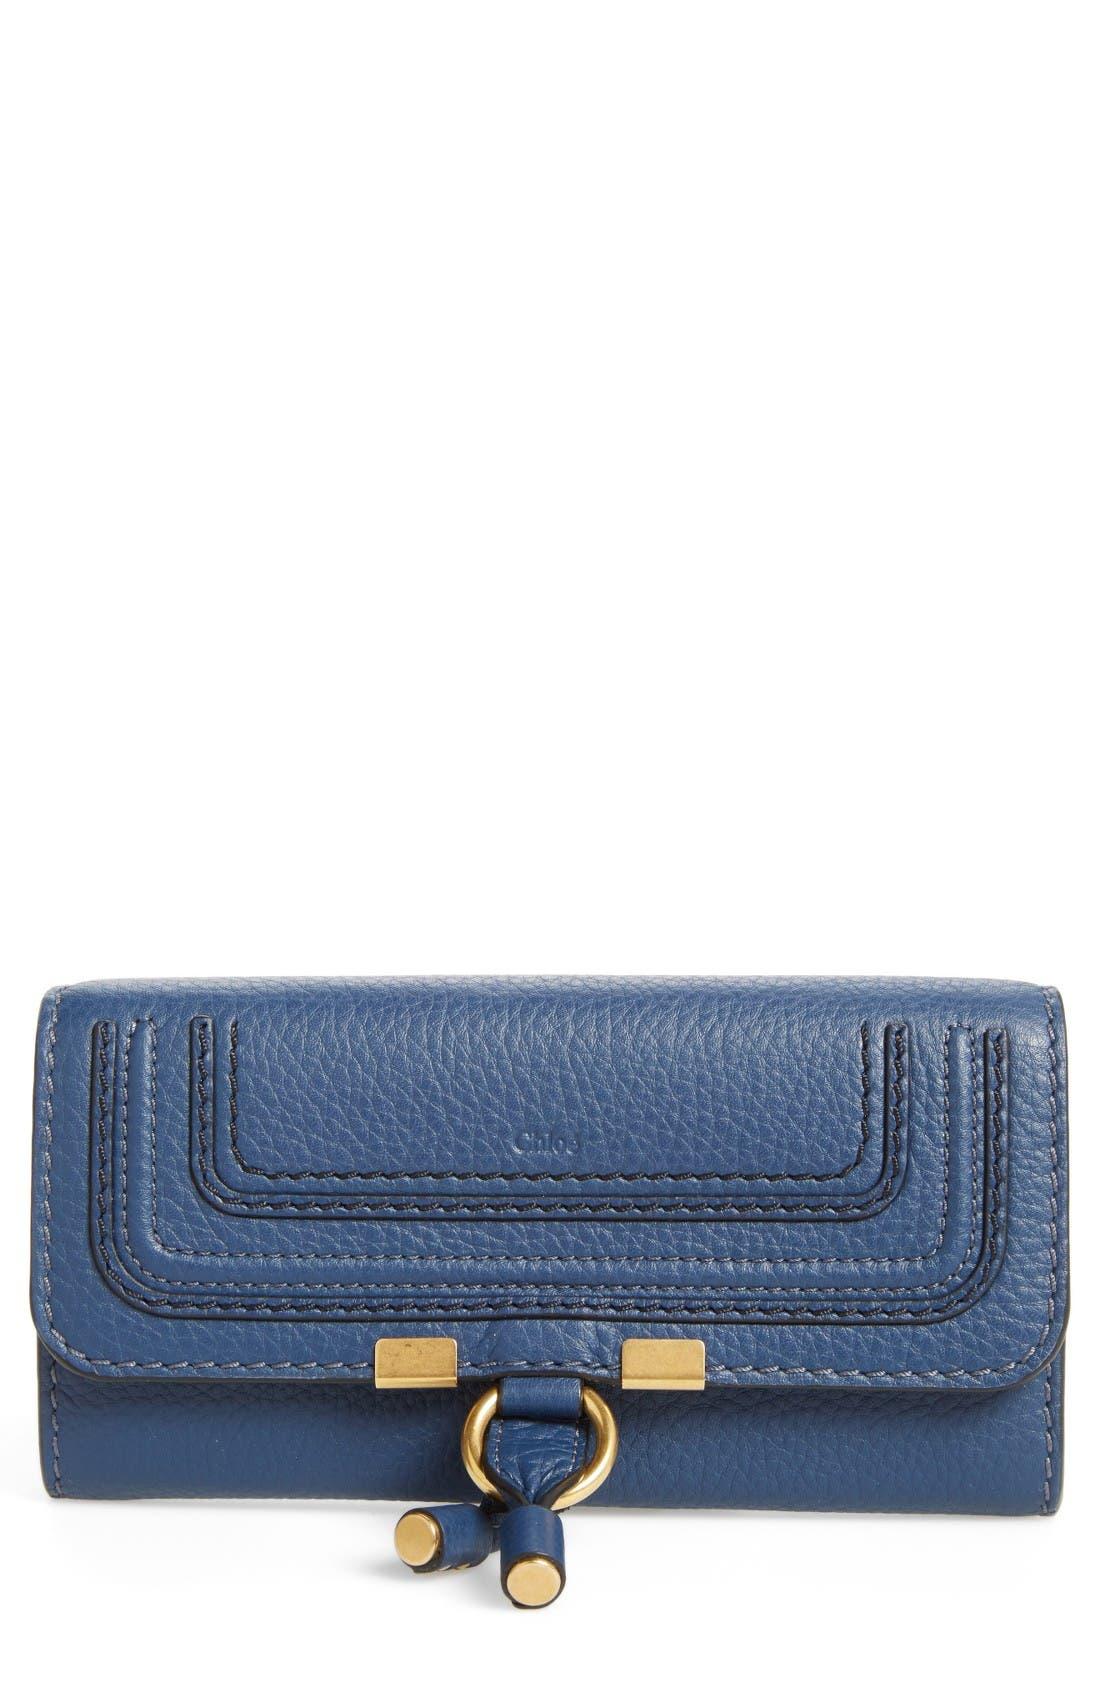 Main Image - Chloé 'Marcie - Long' Leather Flap Wallet